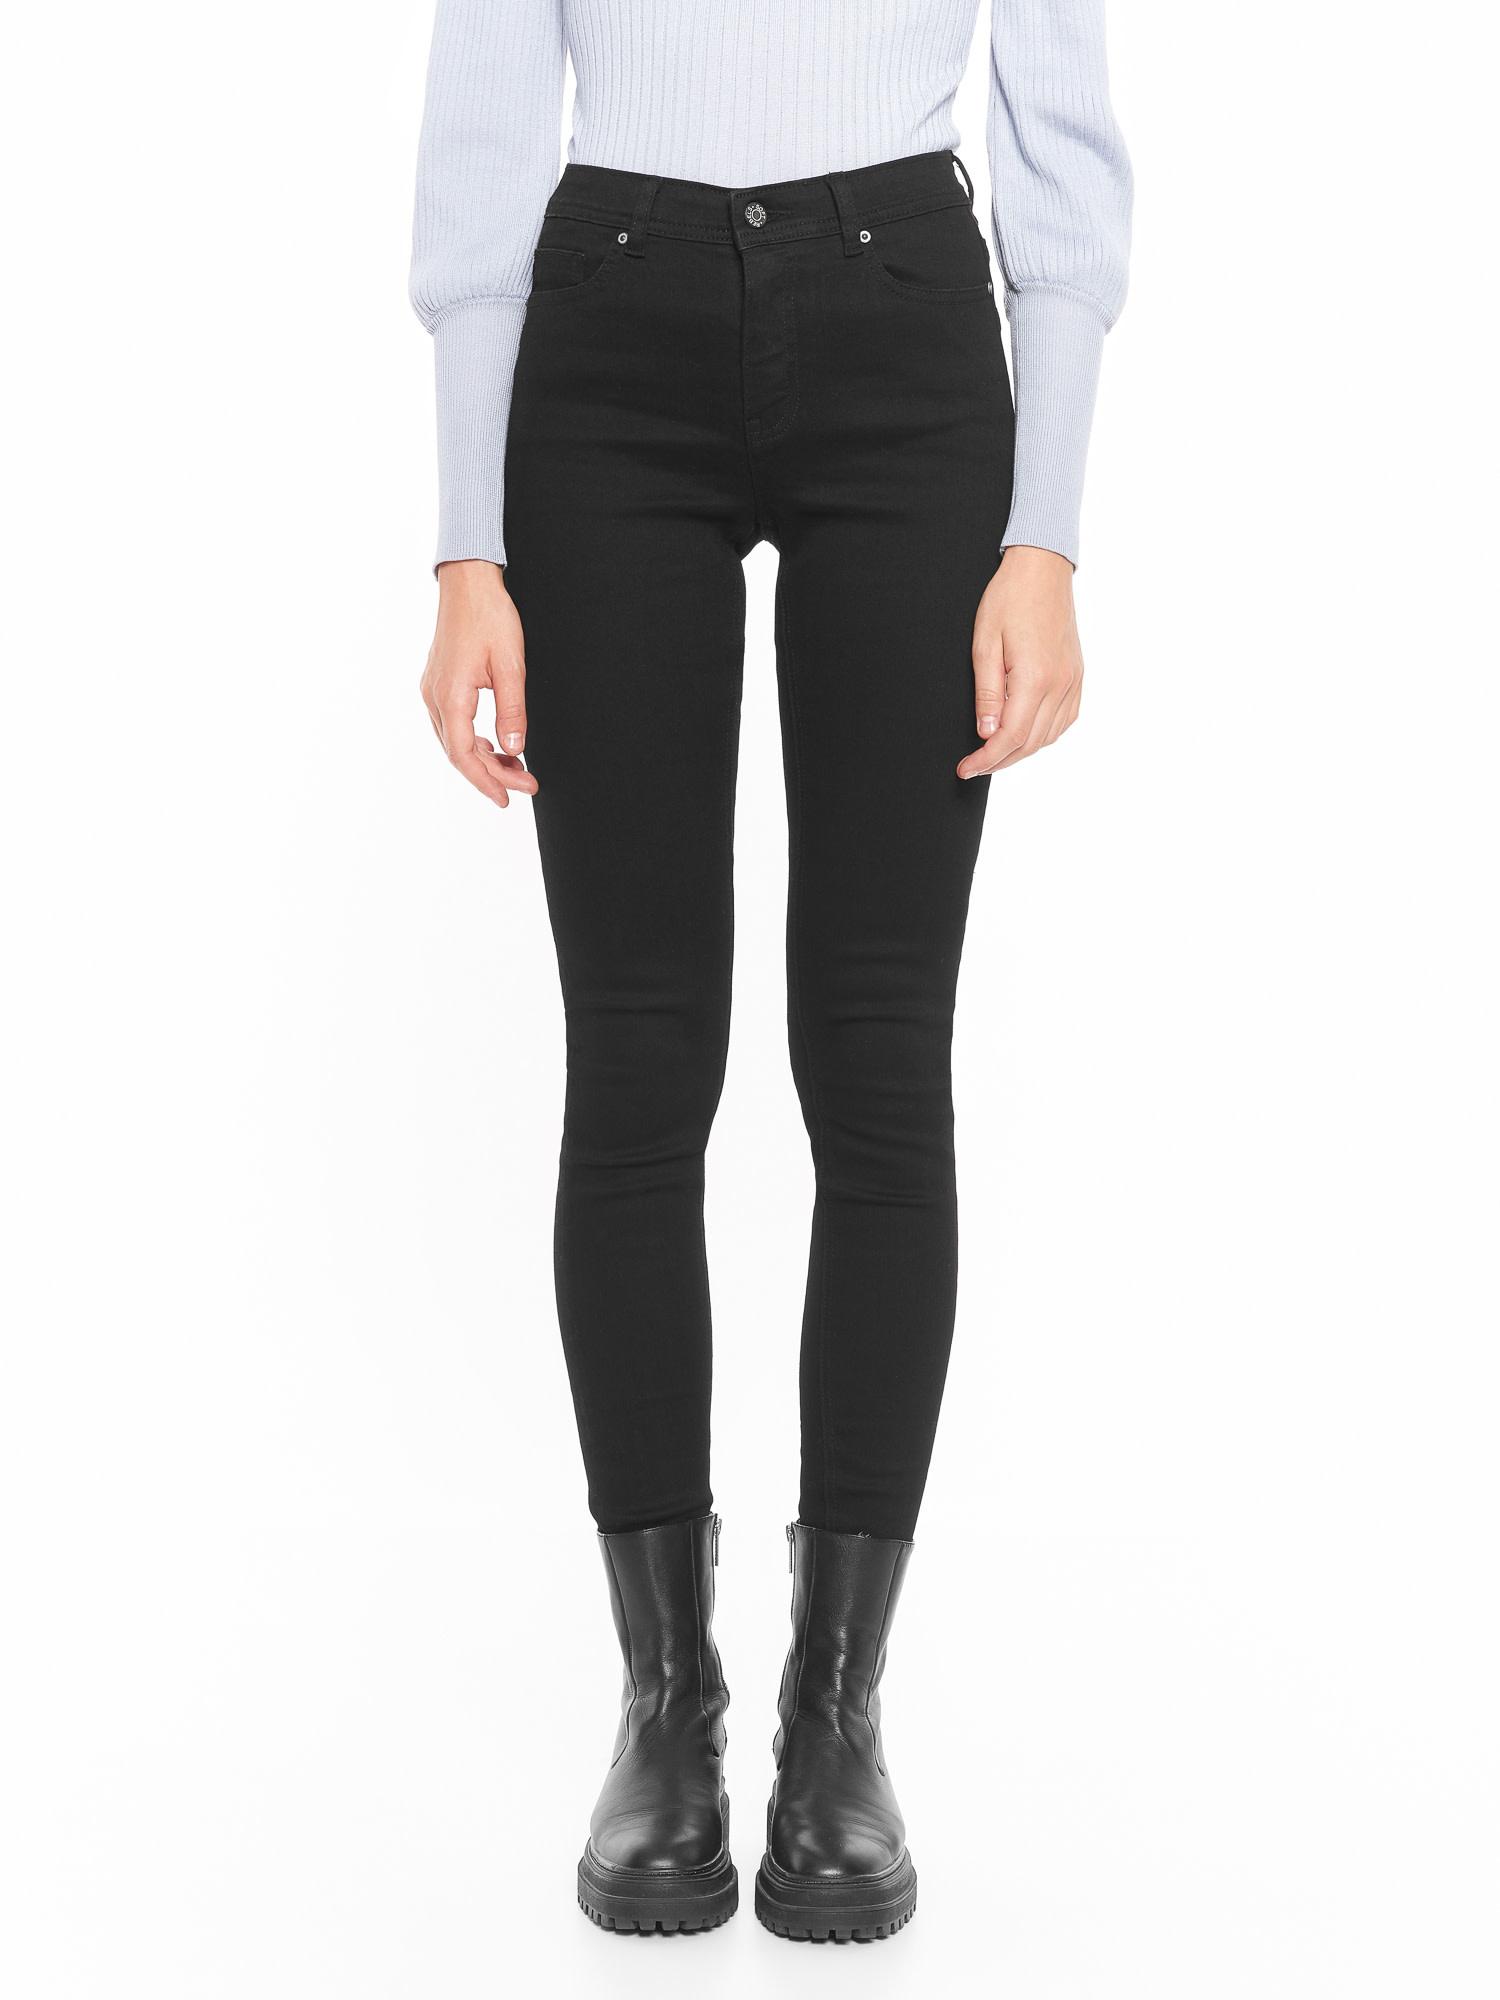 Soft Rebels Mid Rise Slim Jeans - Black - 807